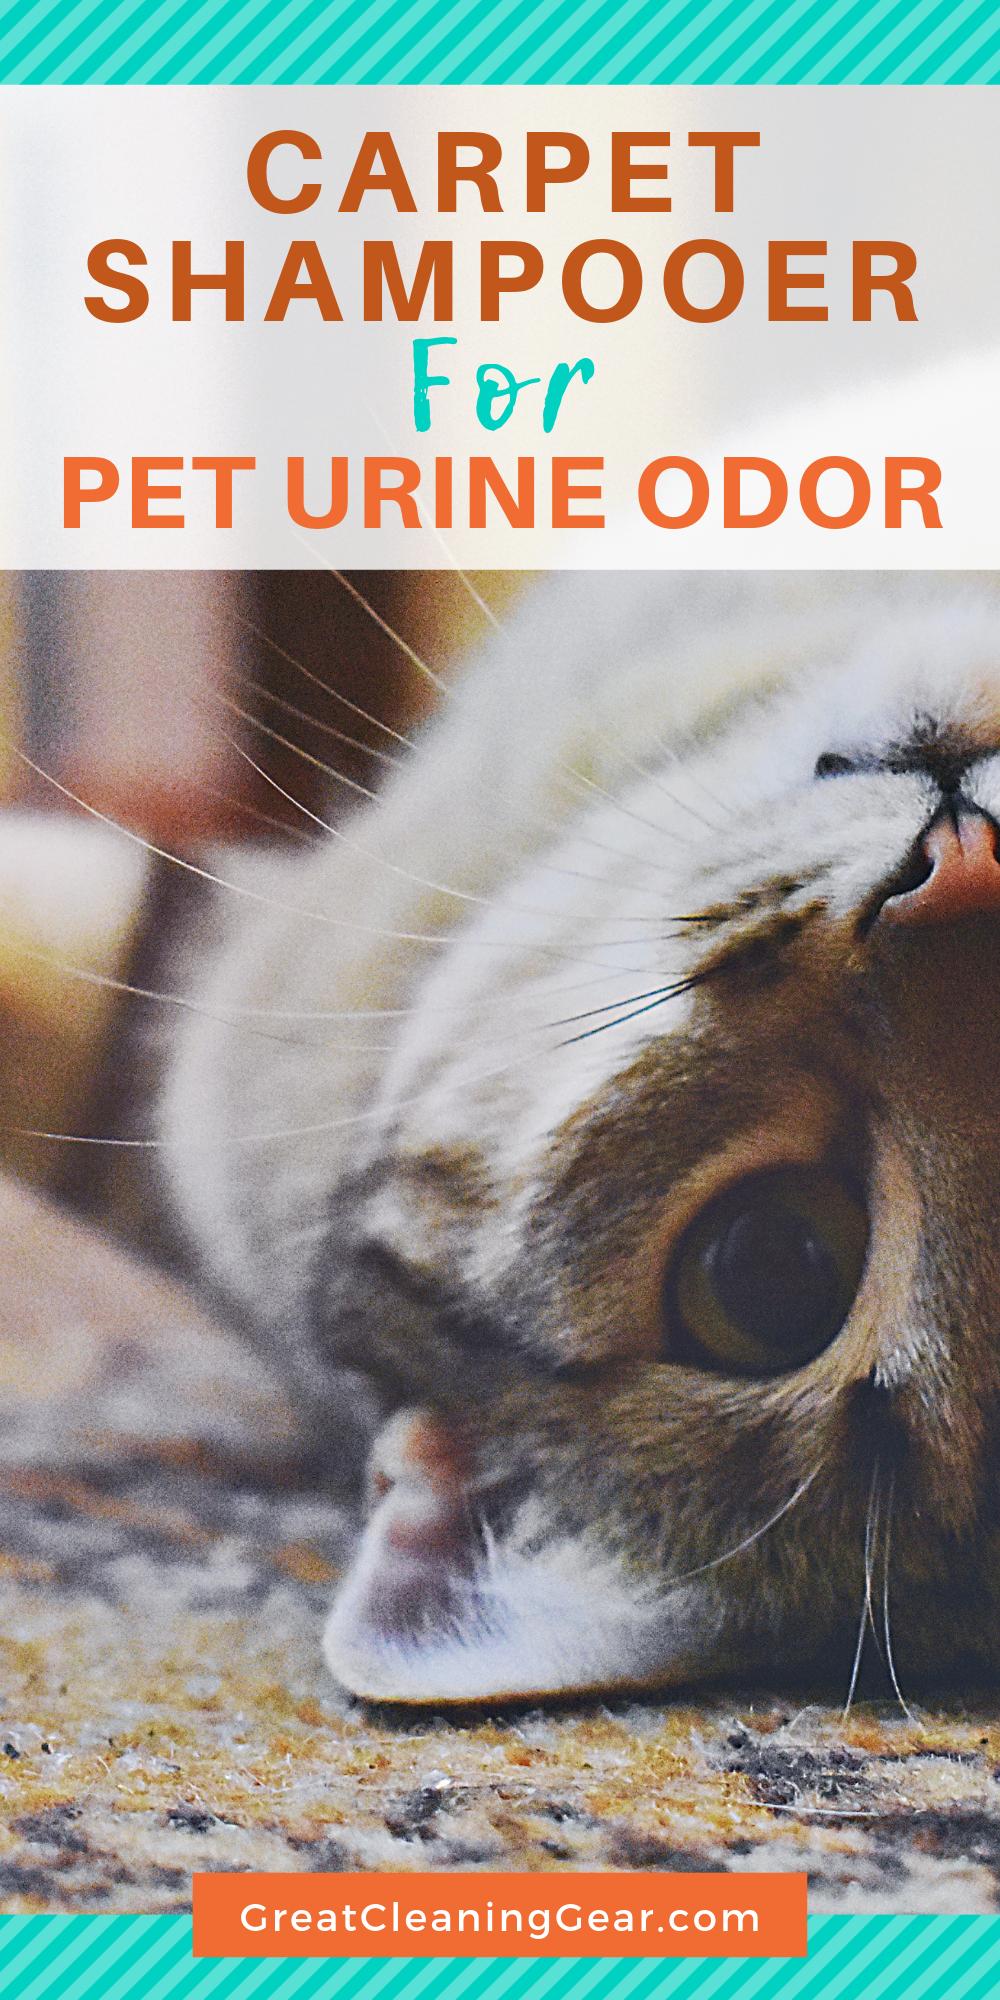 Best Carpet Shampooer for Pet Urine Pet urine, Pet